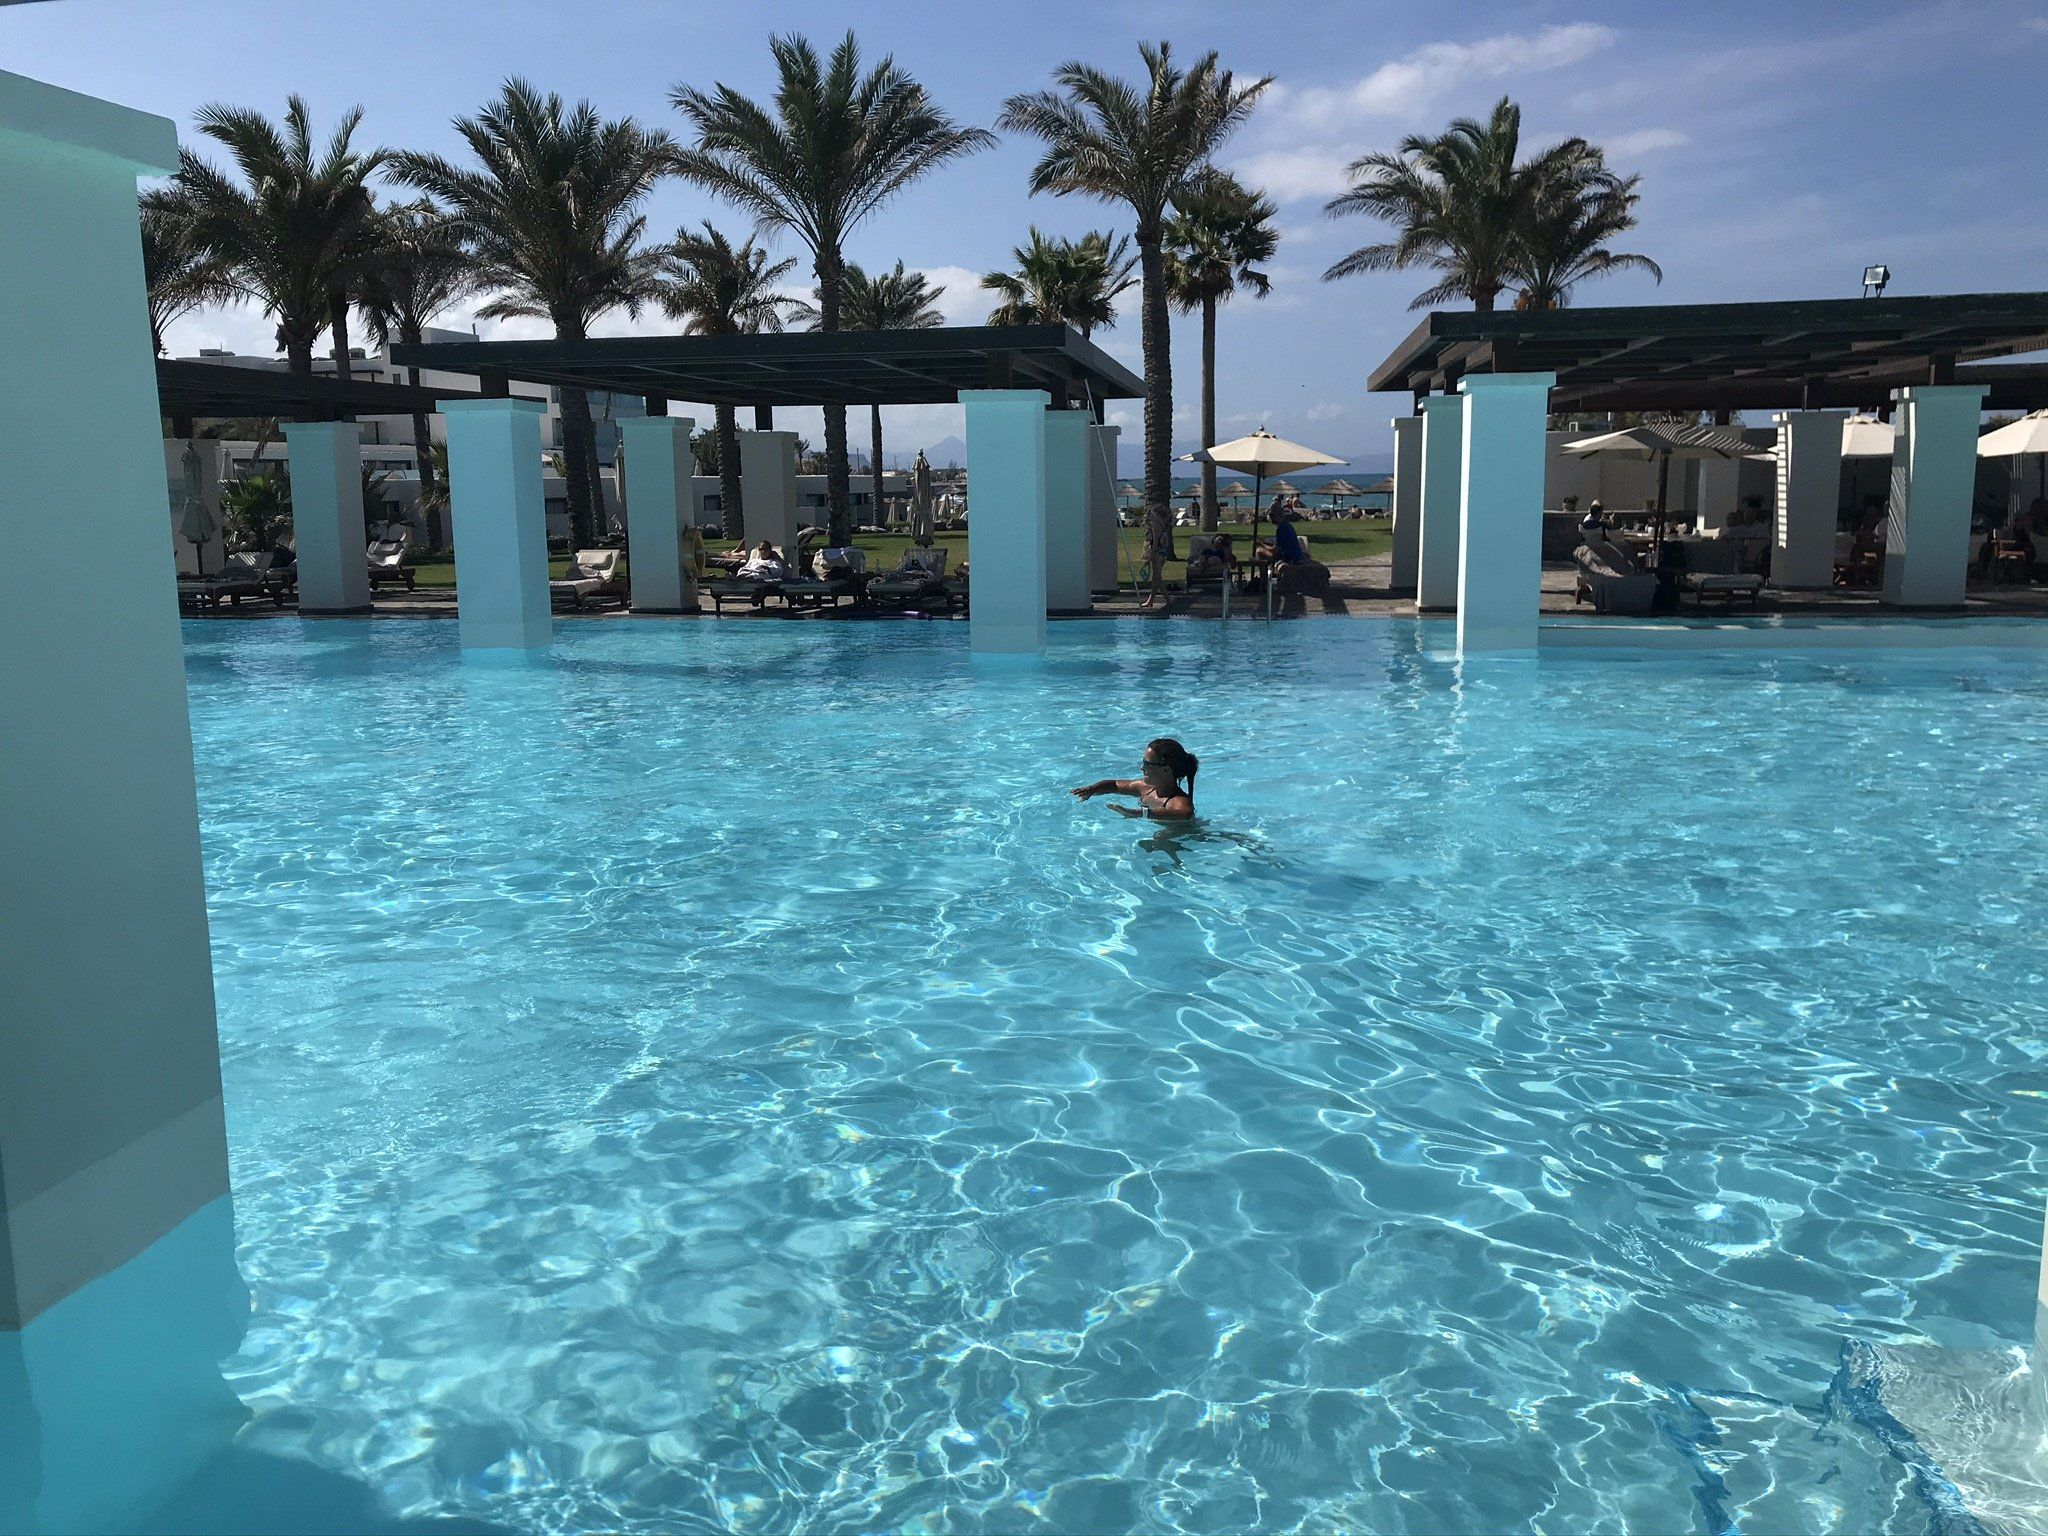 Grecotel Amirandes Blick auf Pool